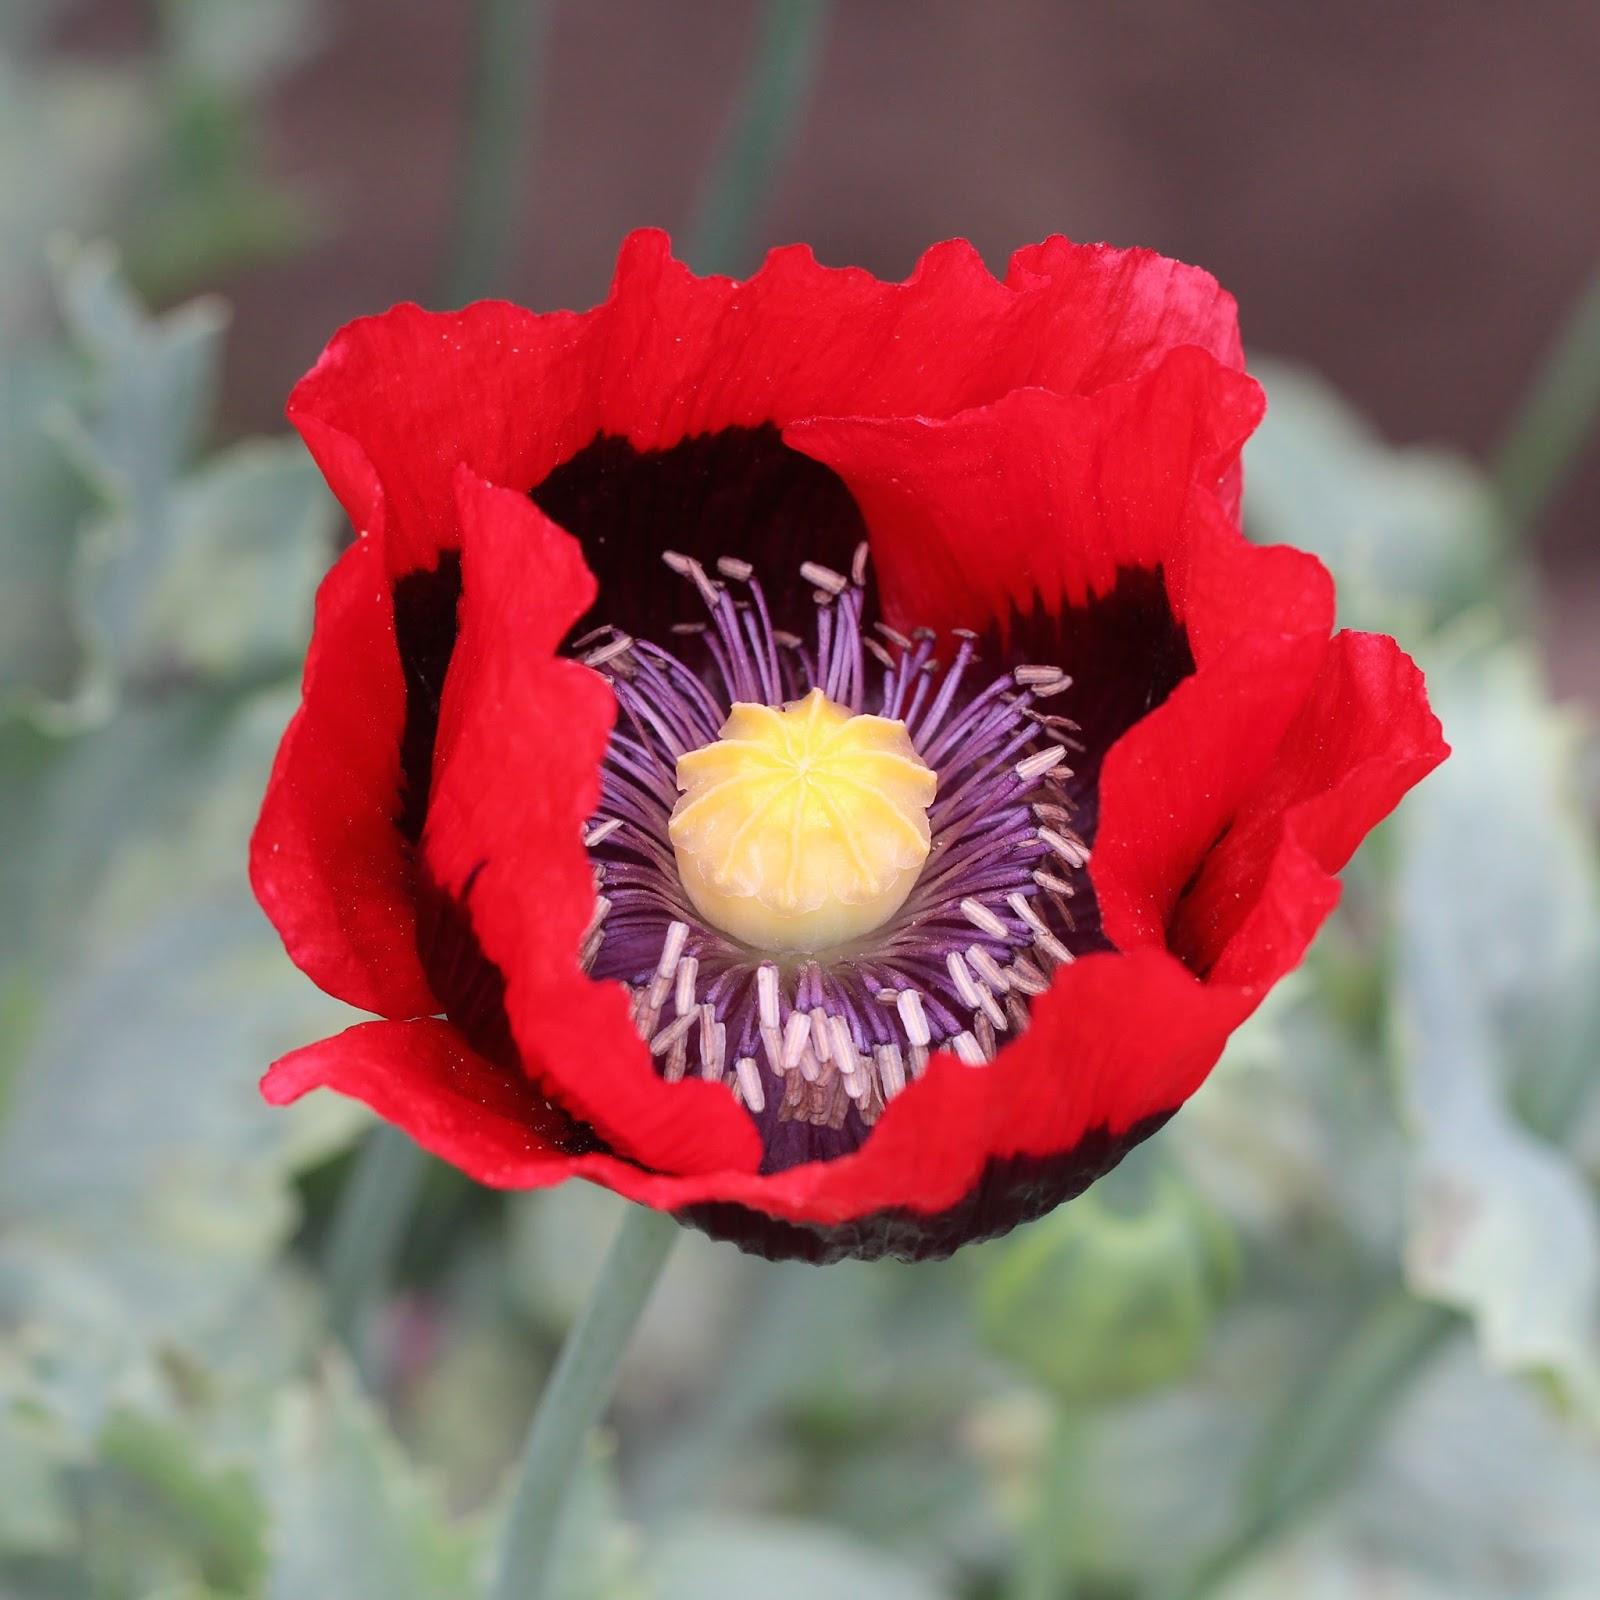 Trogtrogblog Black And White Poppy Pollen